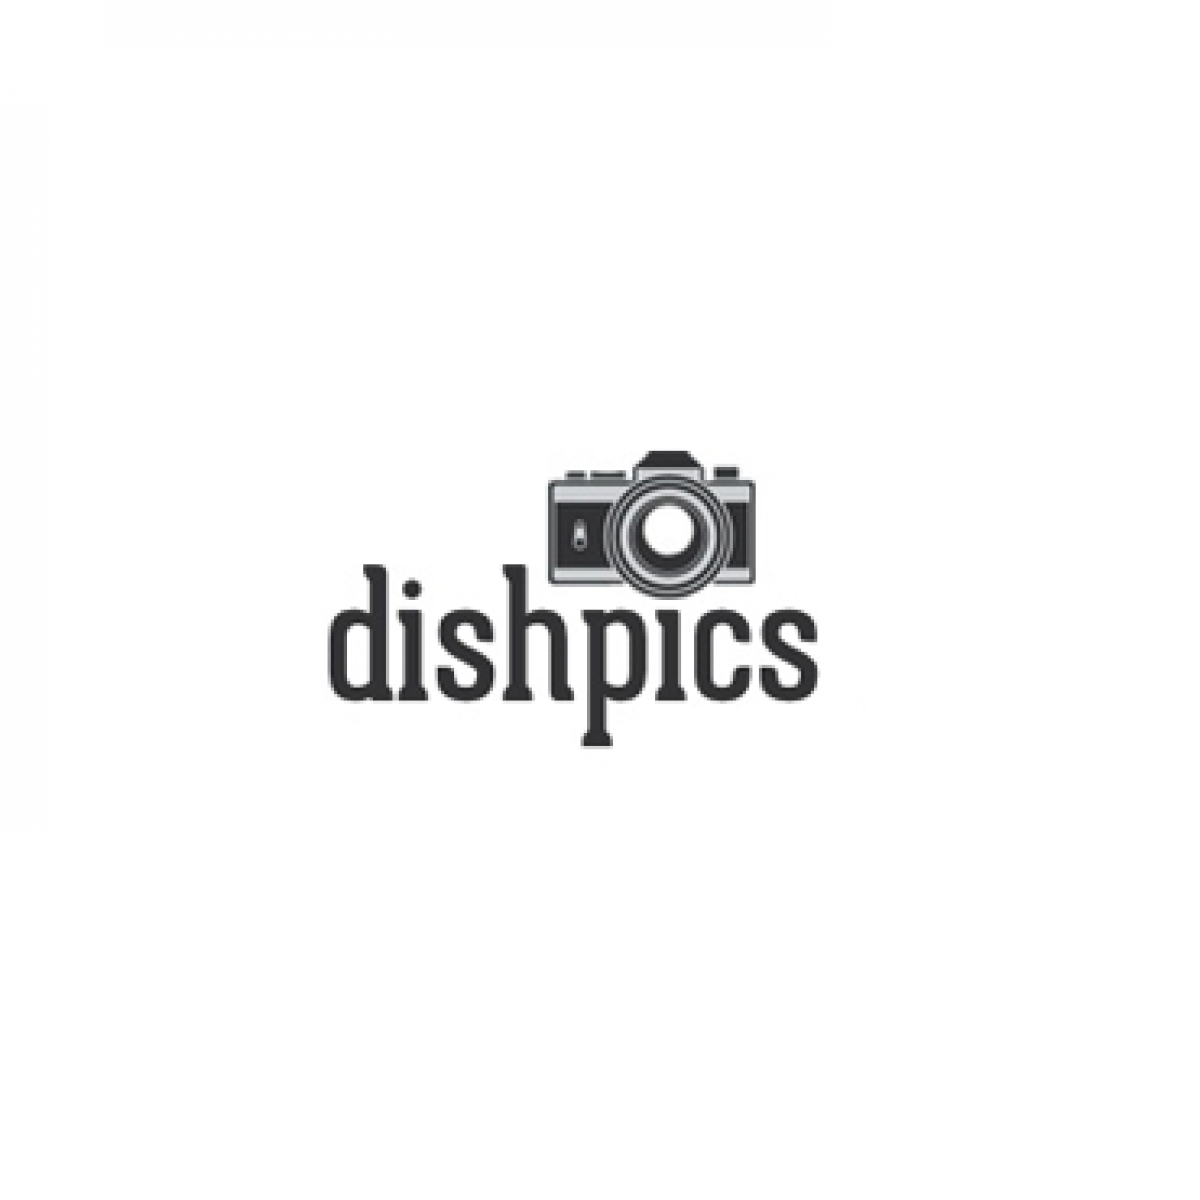 Dishpics